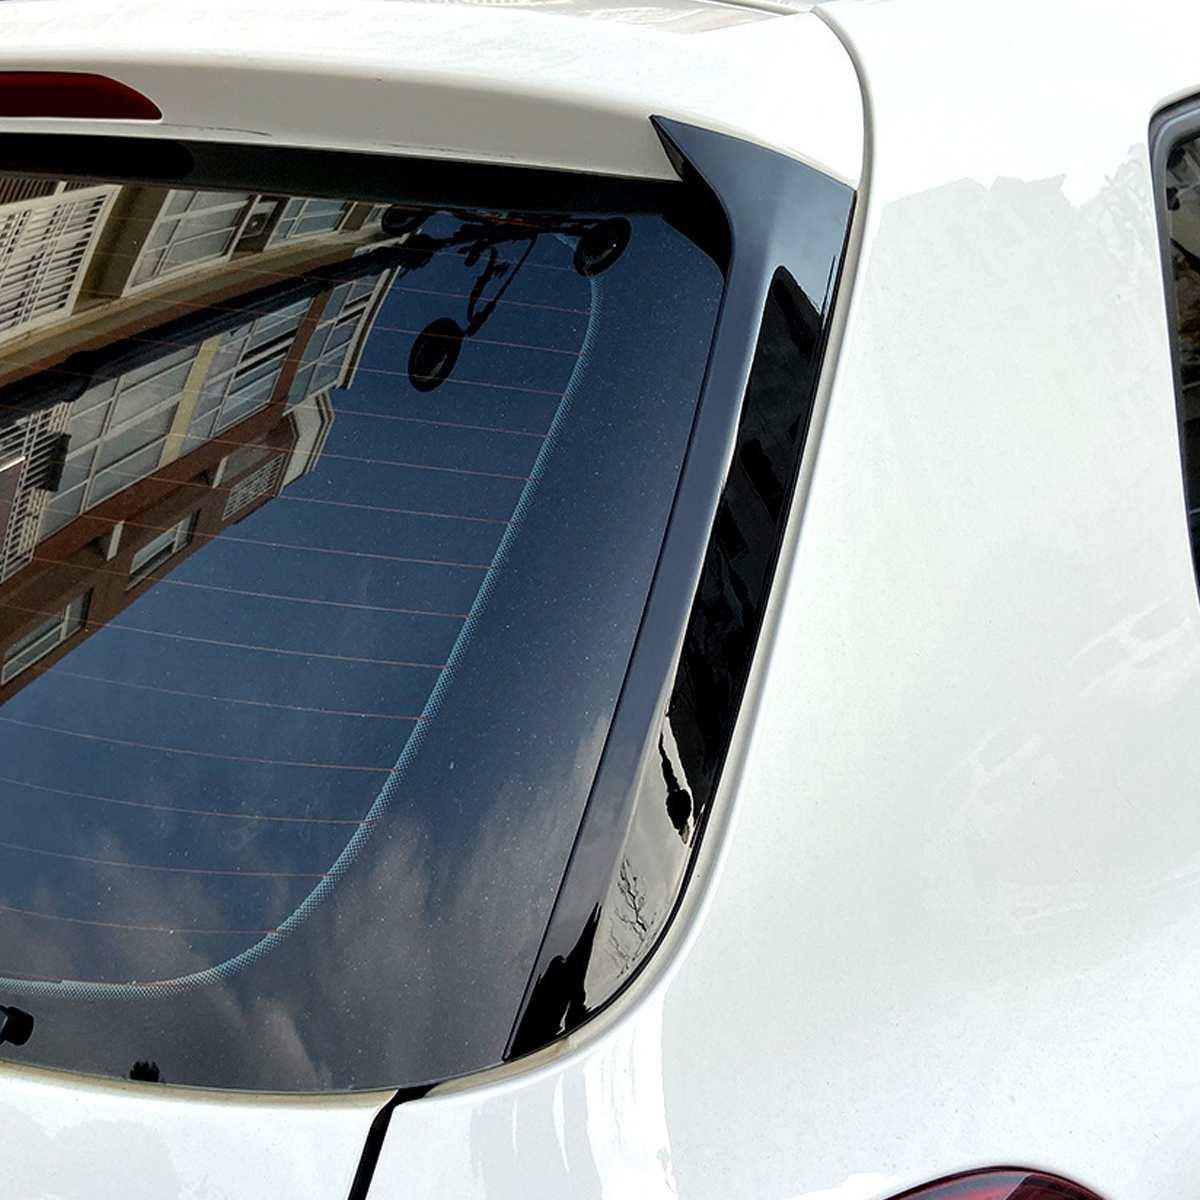 For Vw Volkswagen Passat B6//3C Blade 06-12 Rear Window Windshield Wiper Arm